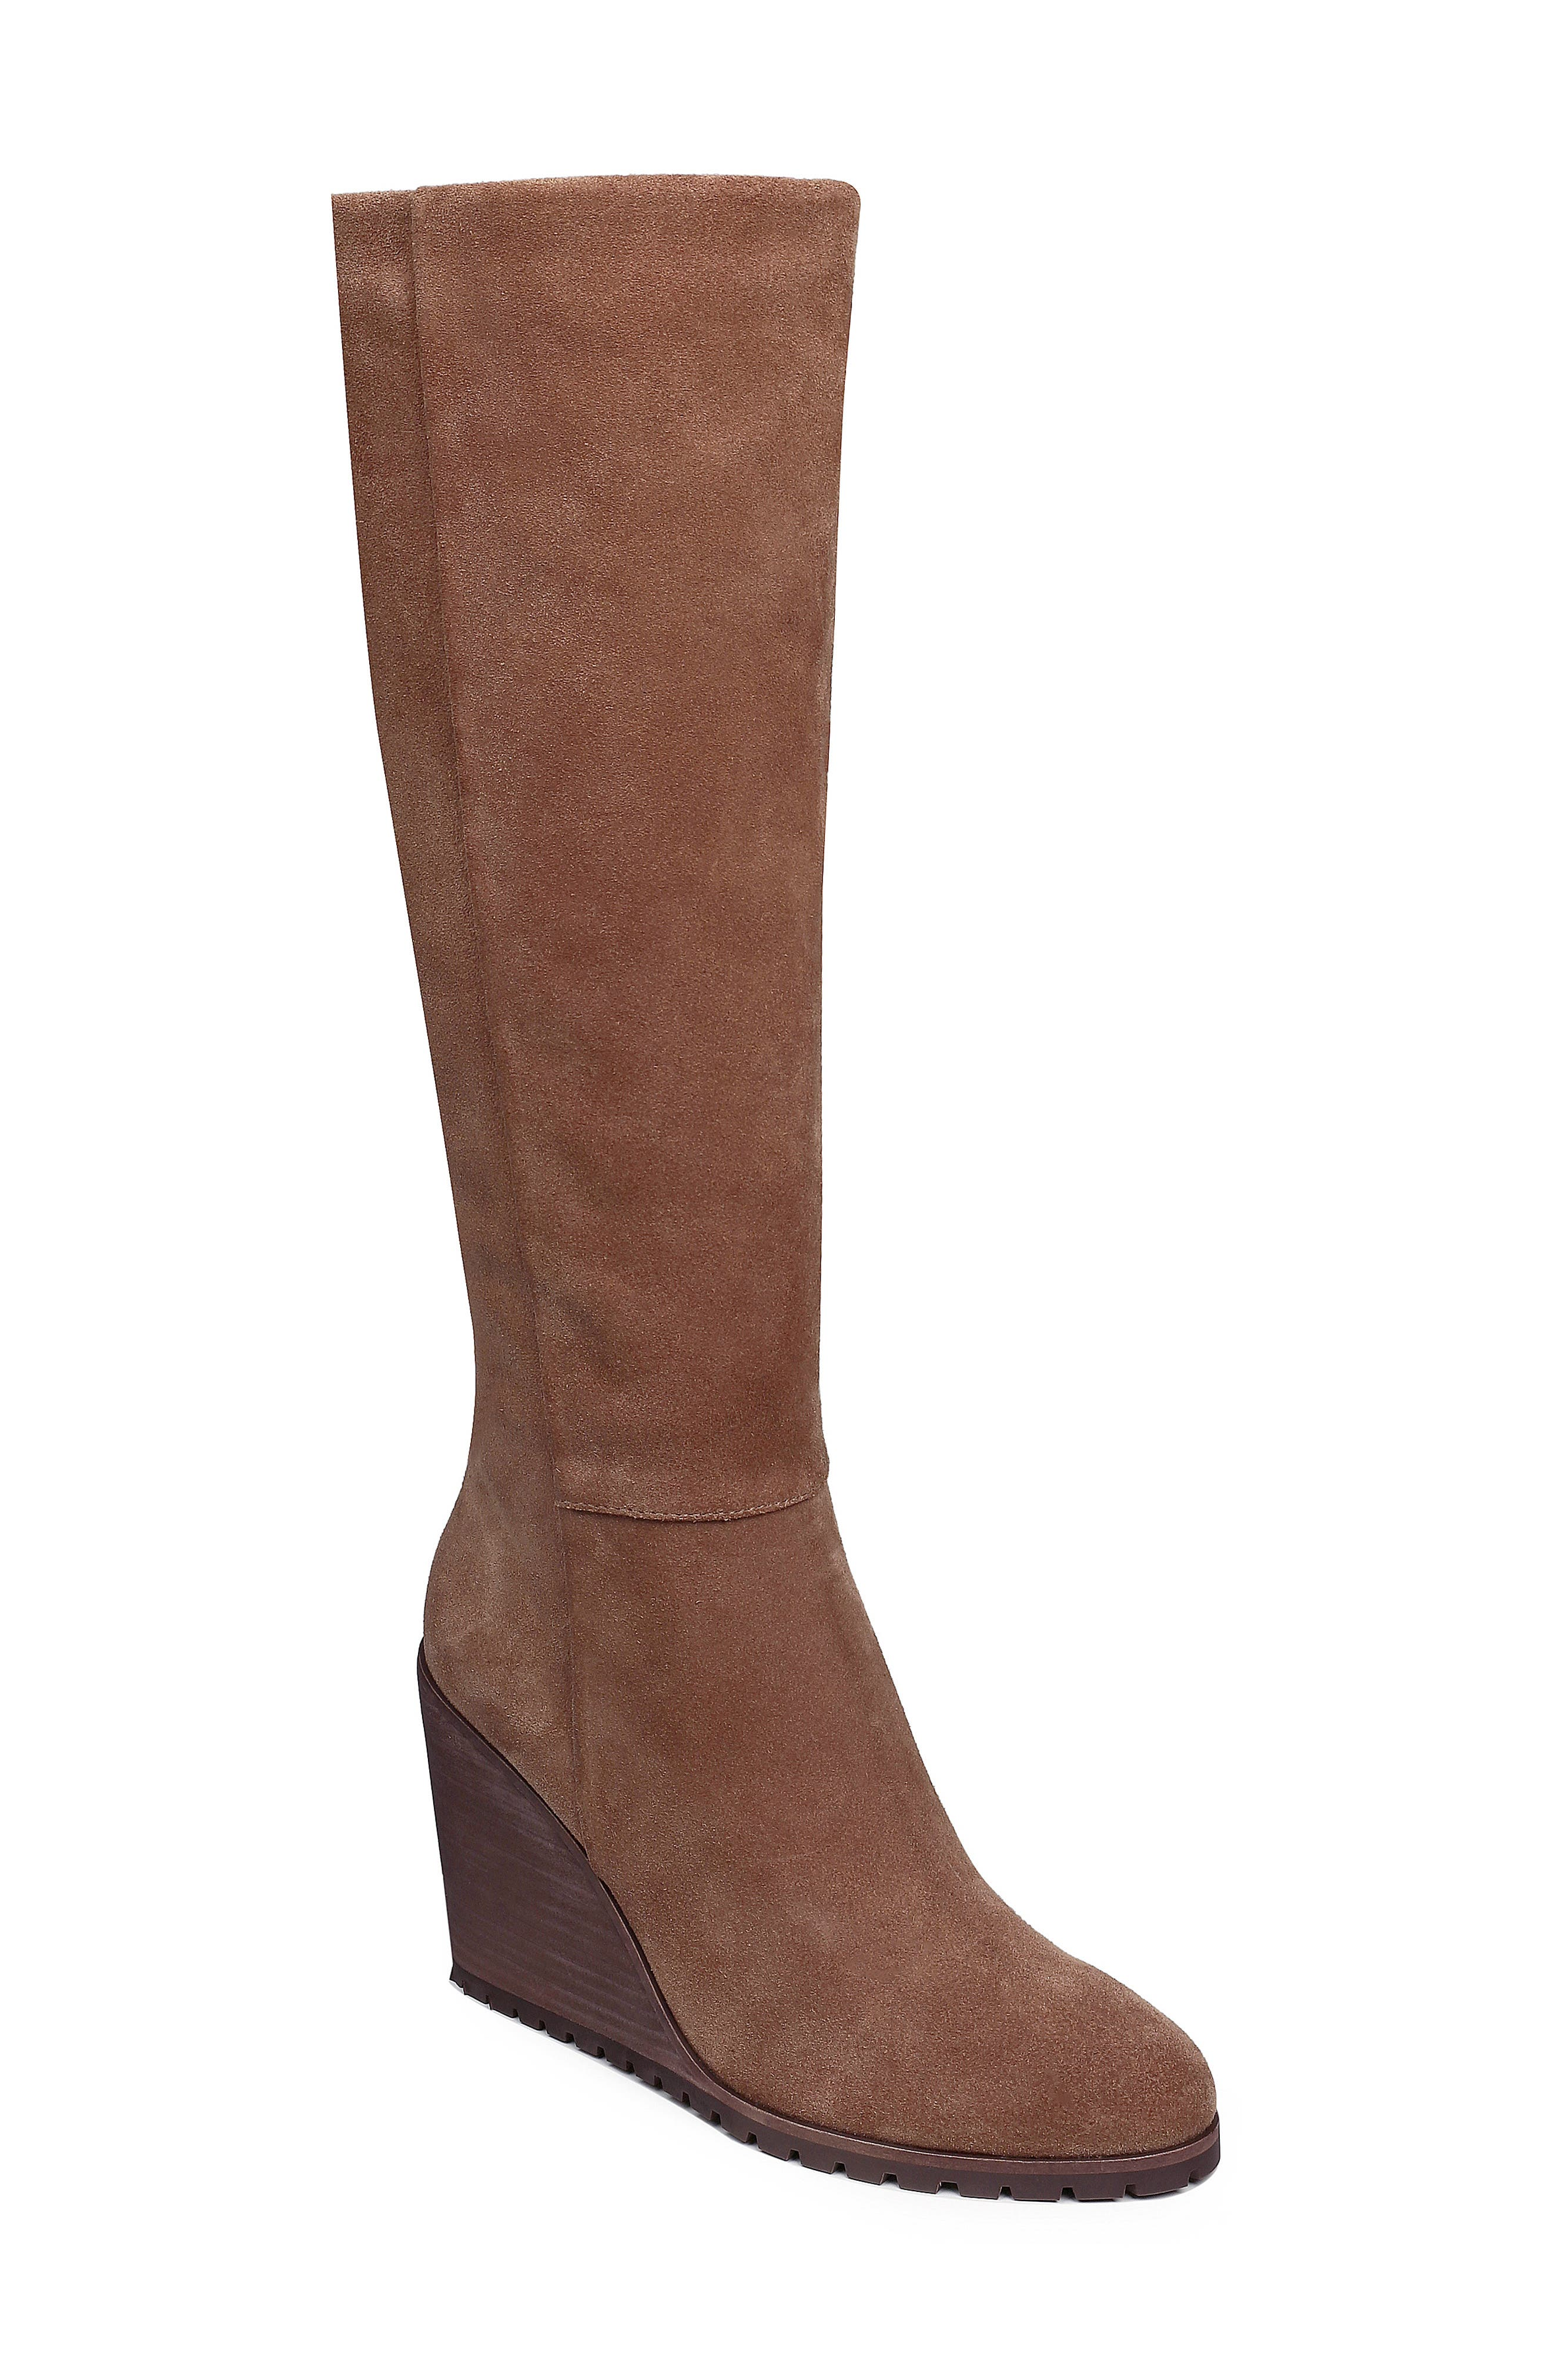 SPLENDID Cleveland Wedge Boot, Main, color, 236